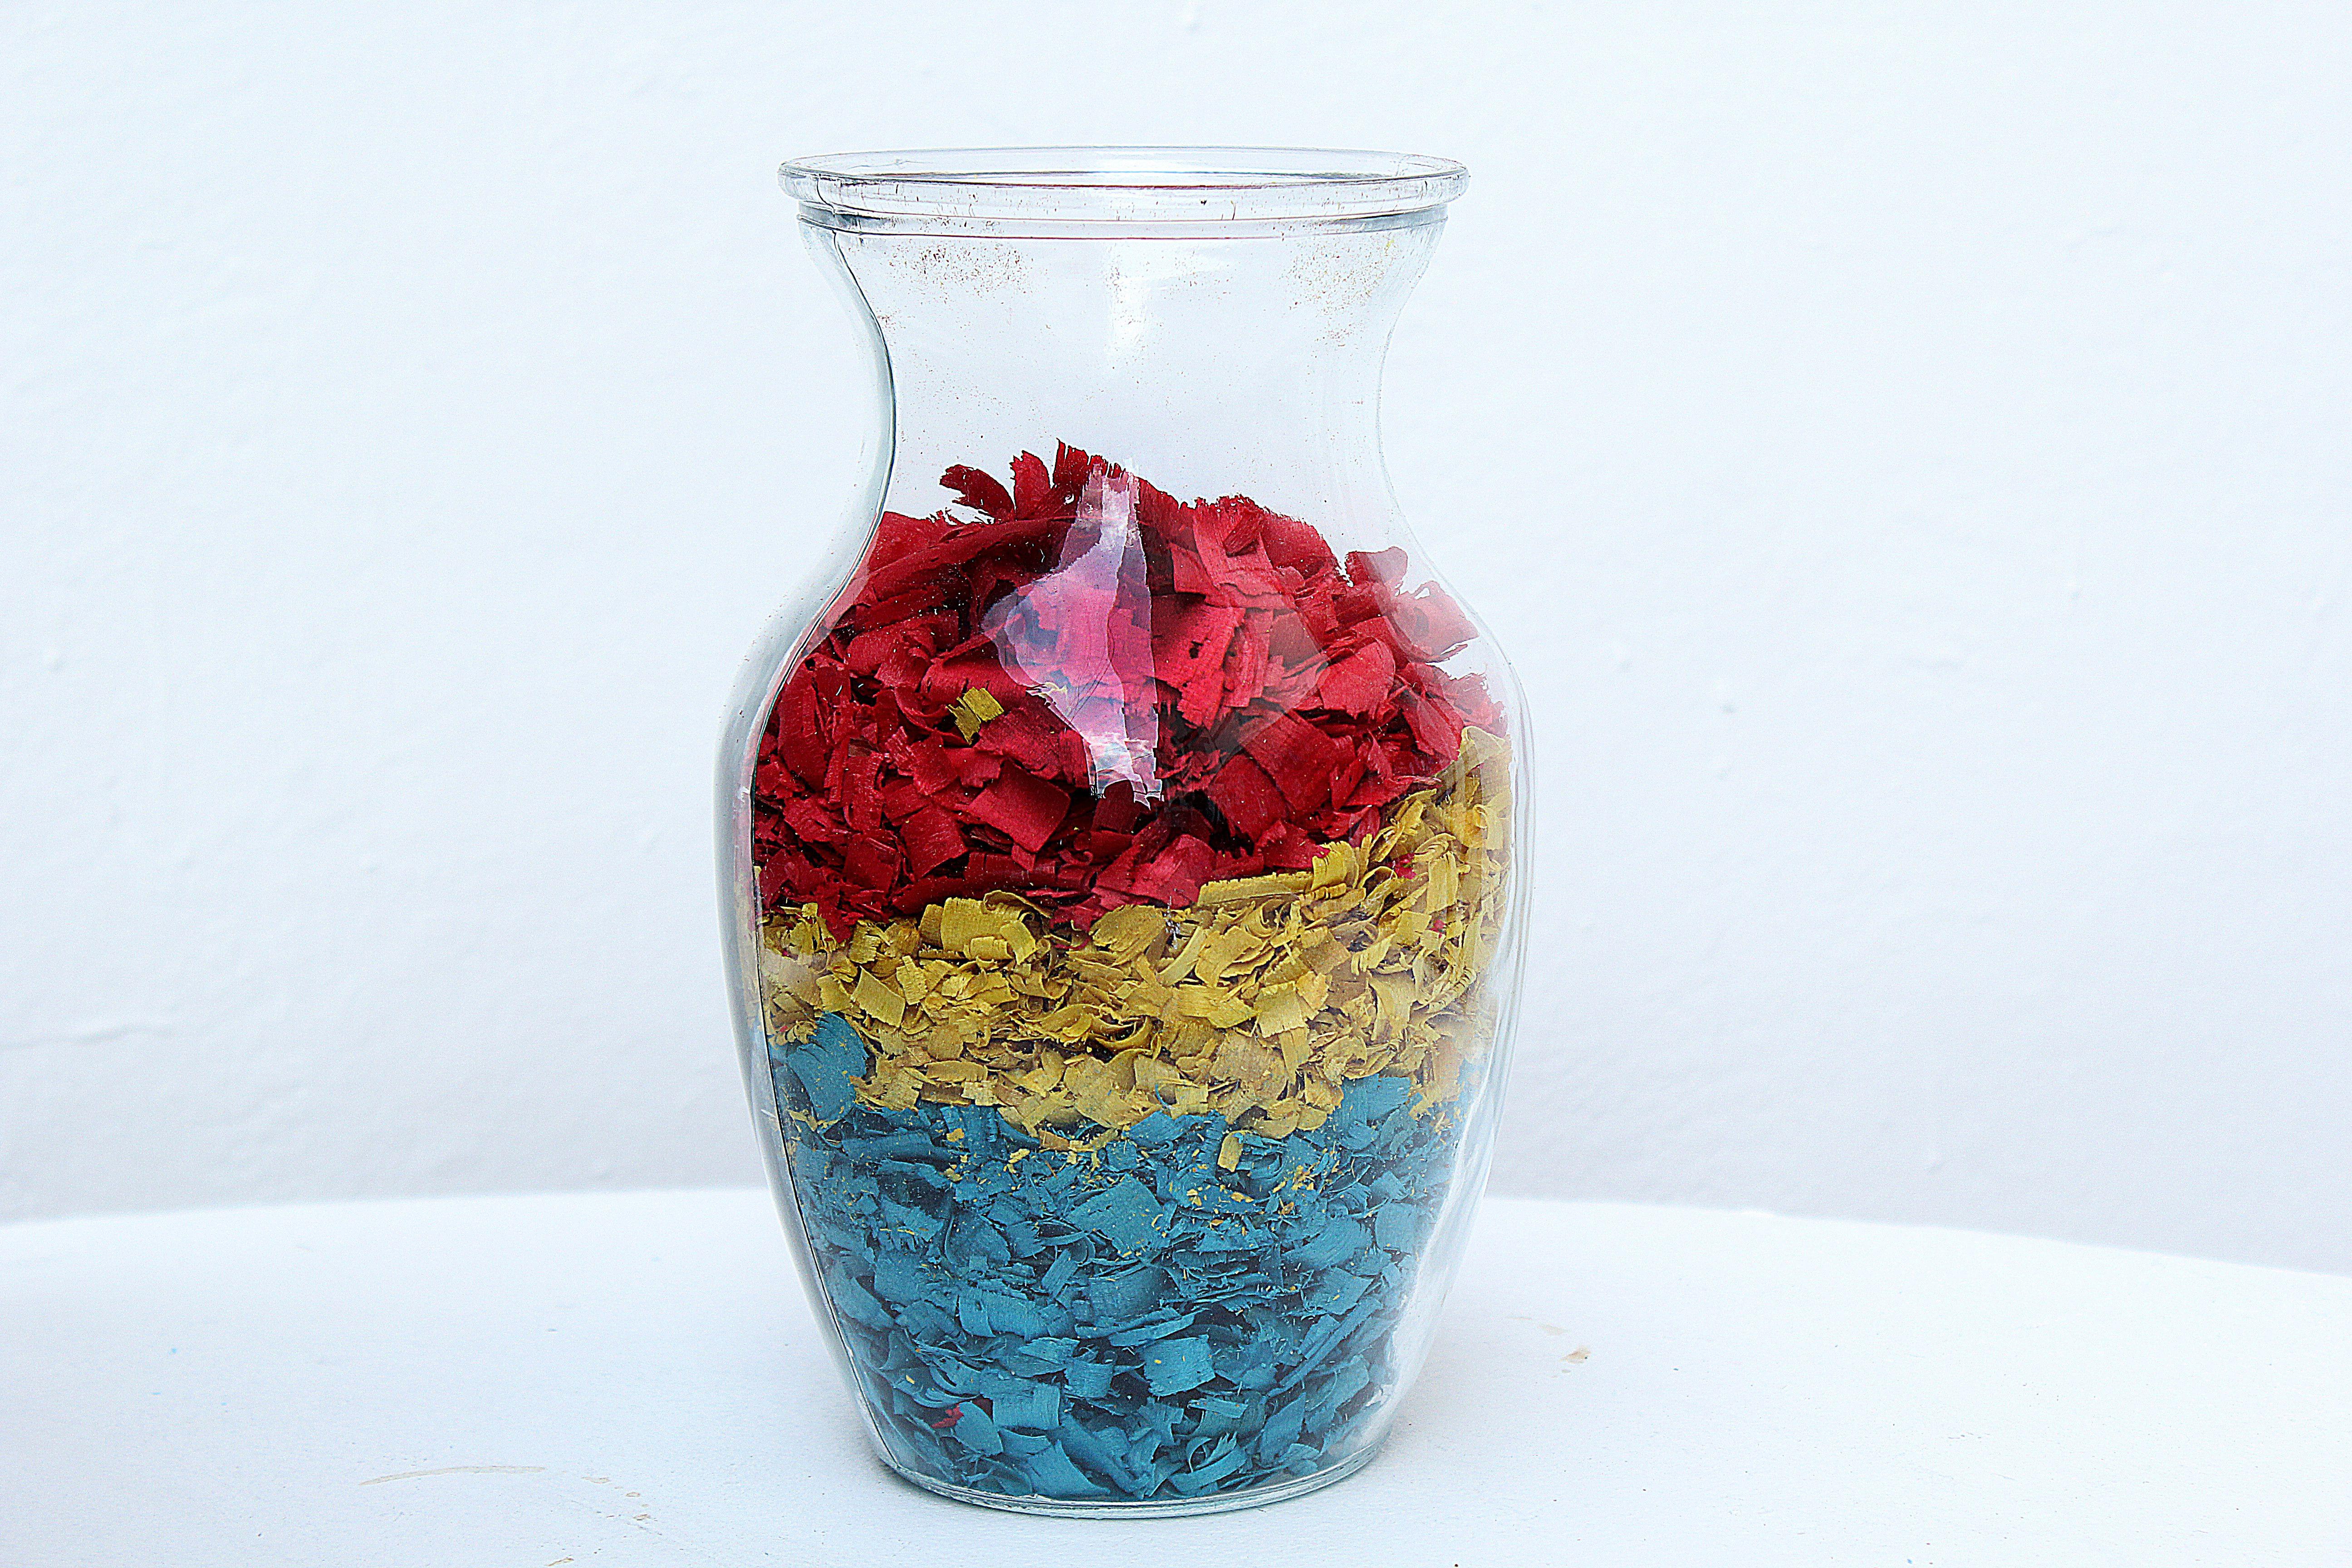 colored mini bud vases of 37 fenton blue glass vase the weekly world intended for coloring colored glass vases elegant living room vase glass fresh